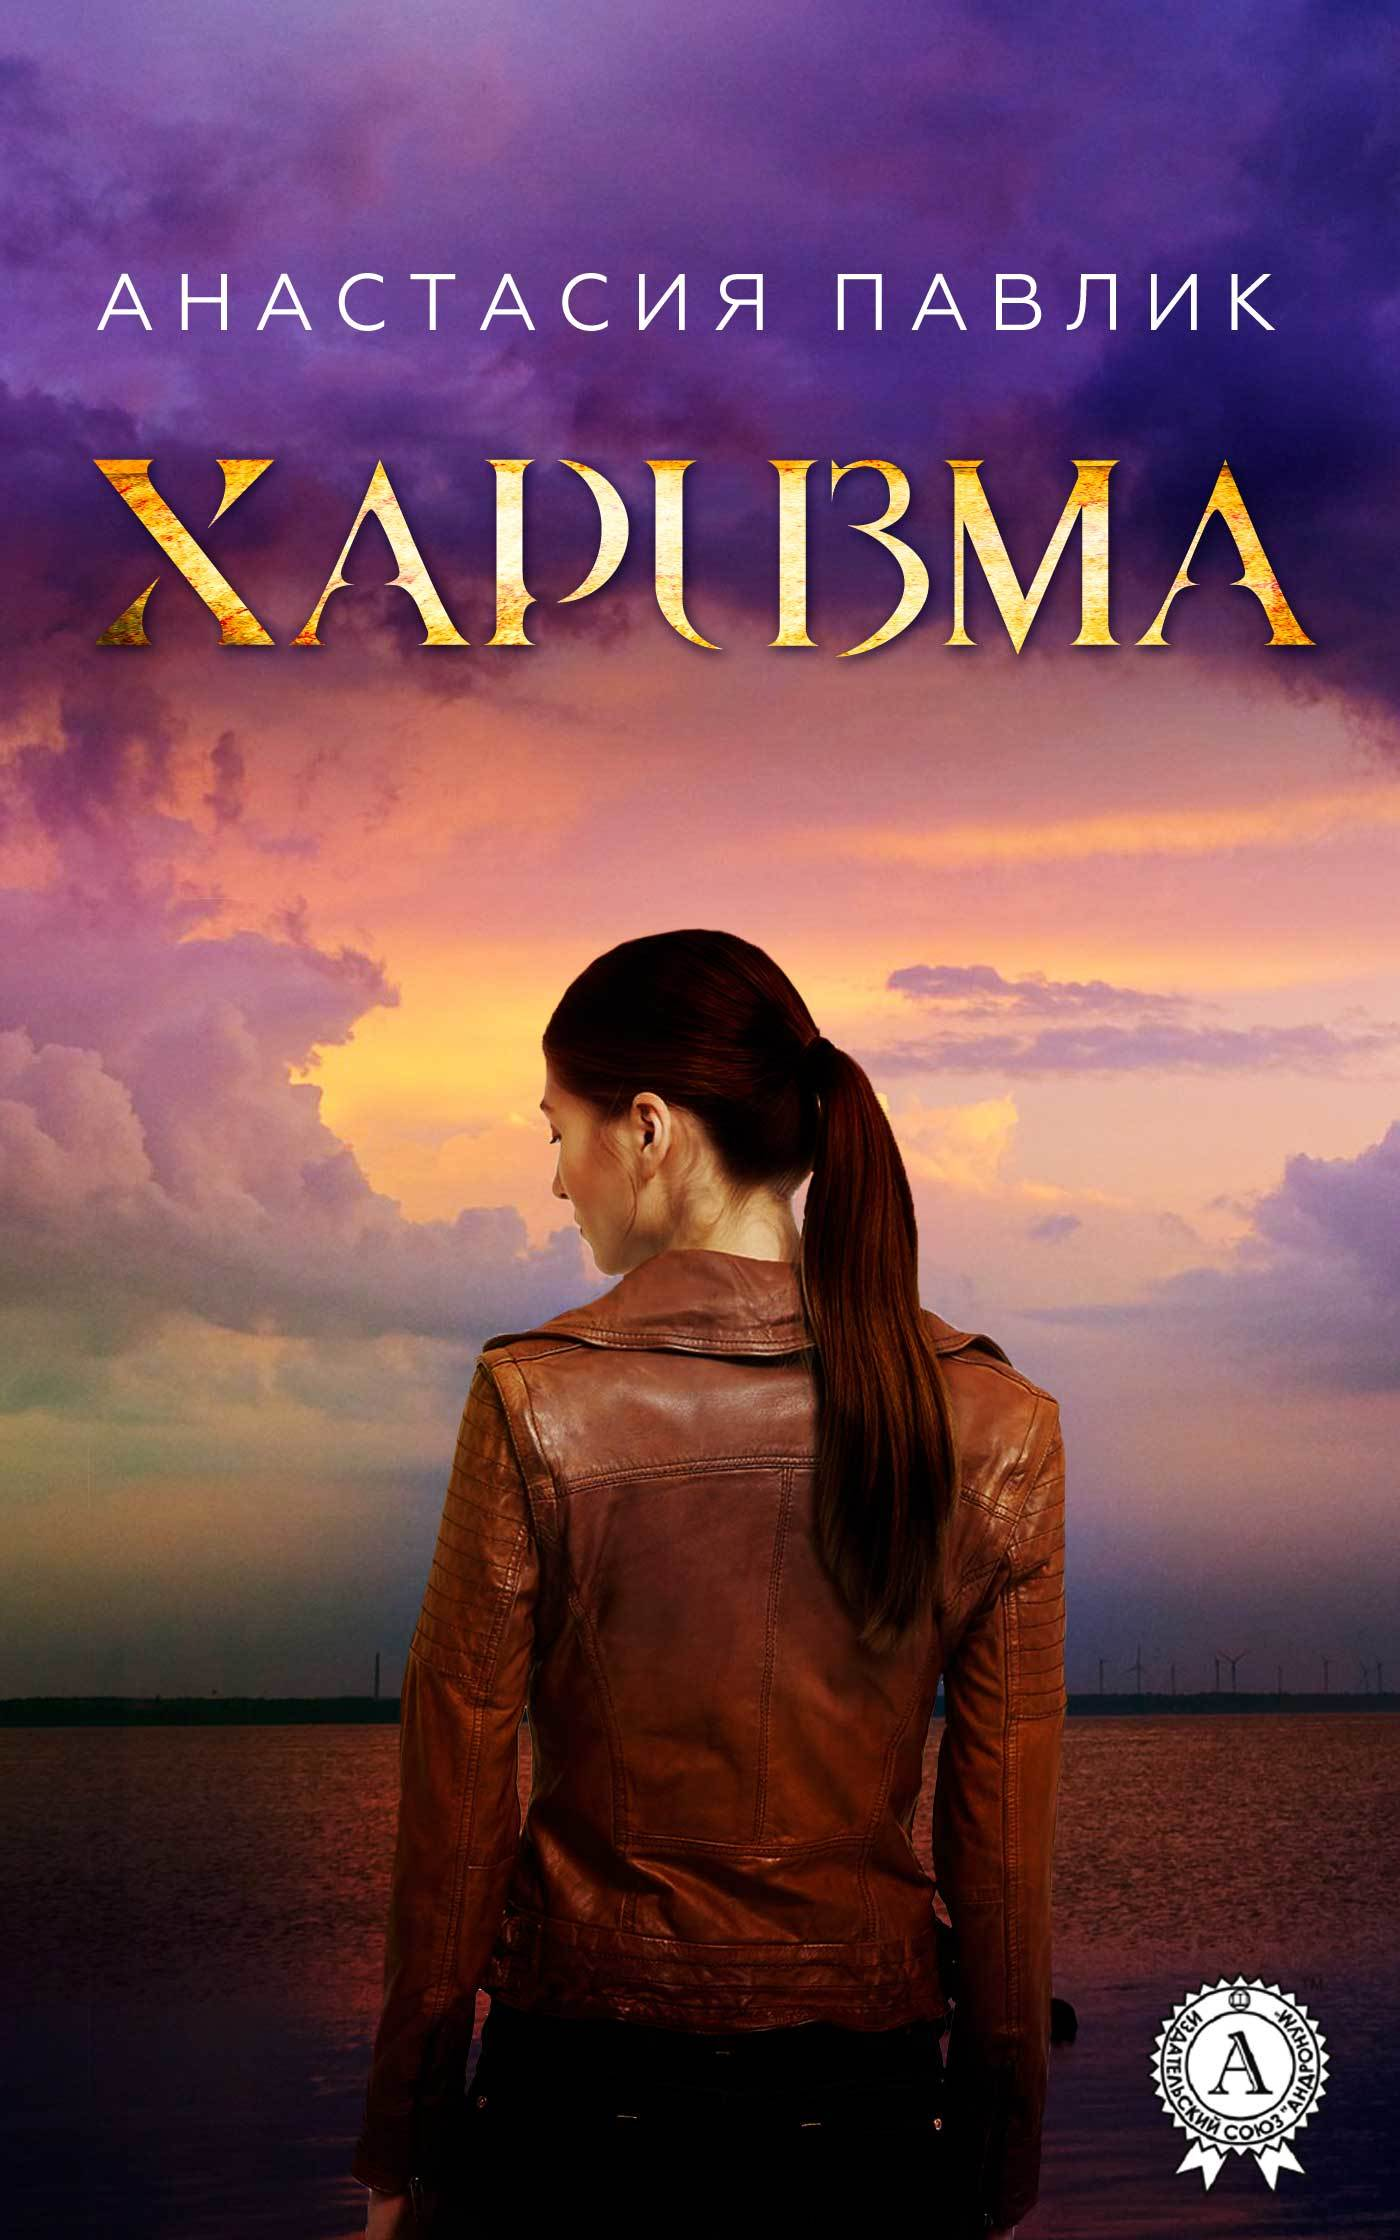 Анастасия Павлик - Харизма